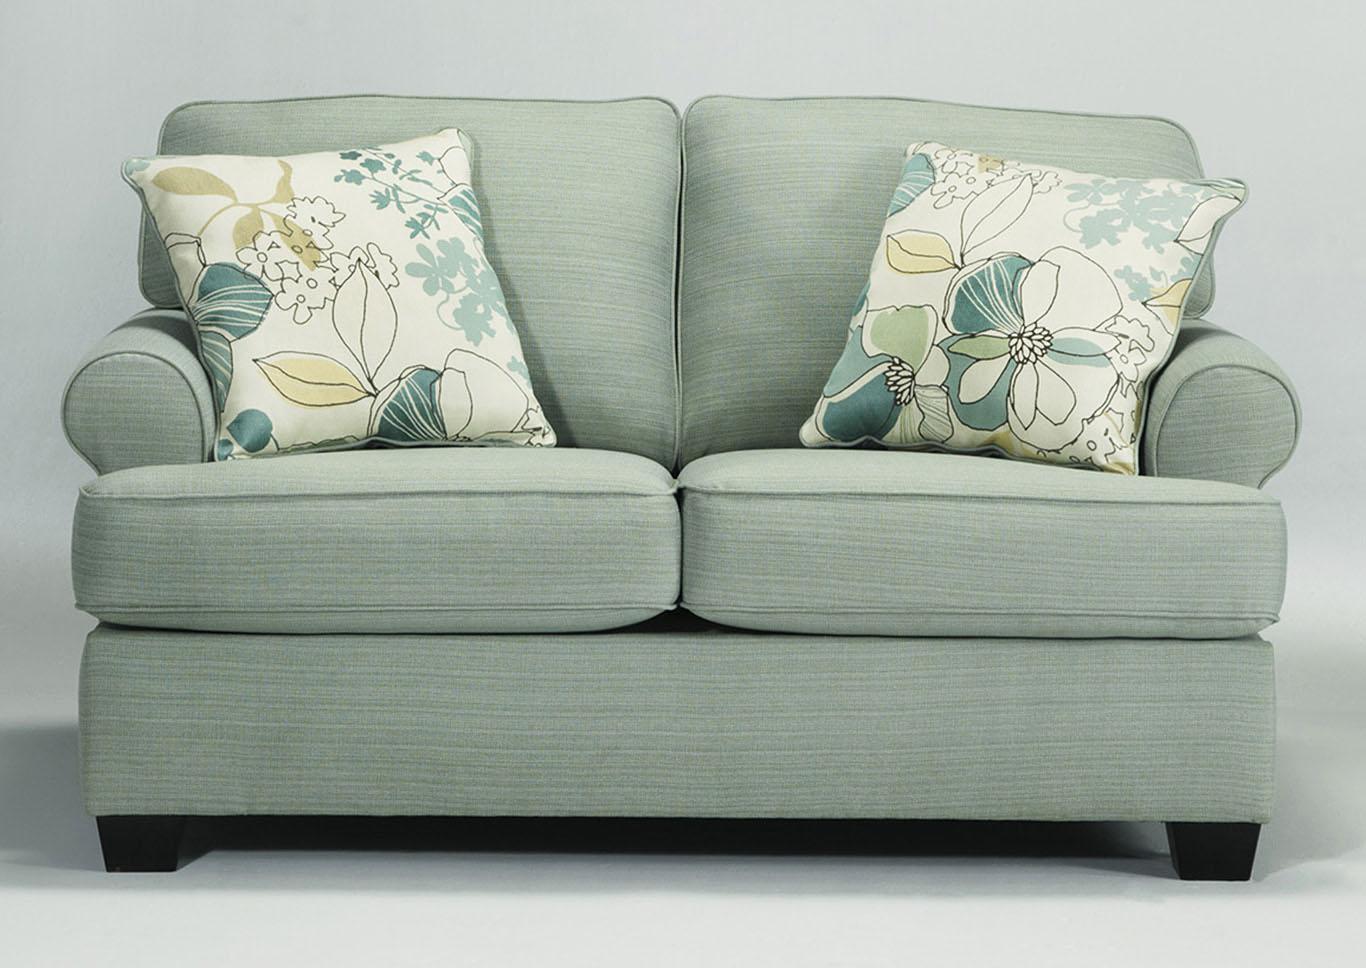 Cozi Furniture New Carrollton Md Daystar Seafoam Loveseat